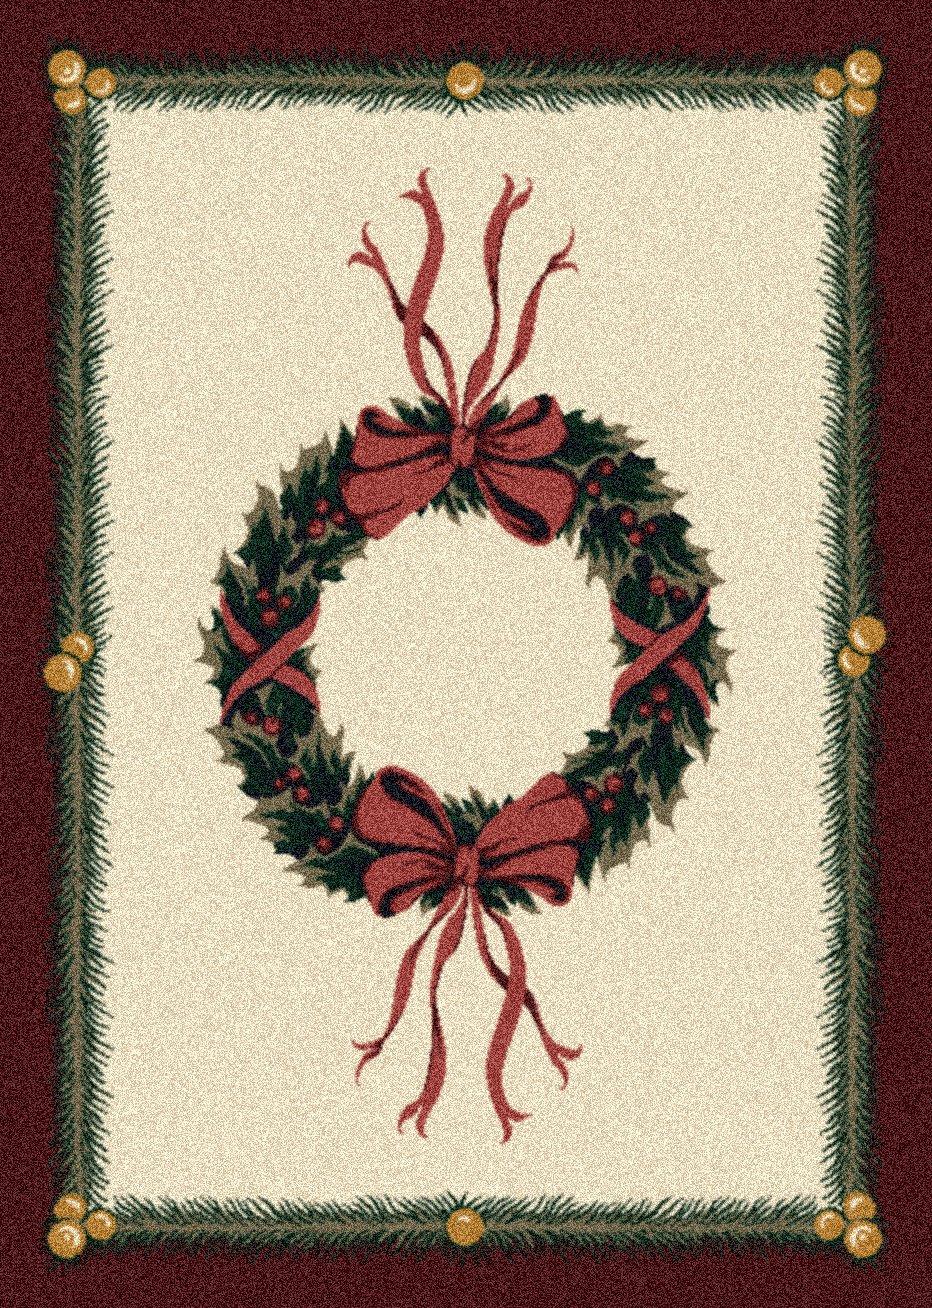 Winter Holiday Wreath Rug from Wayfair!